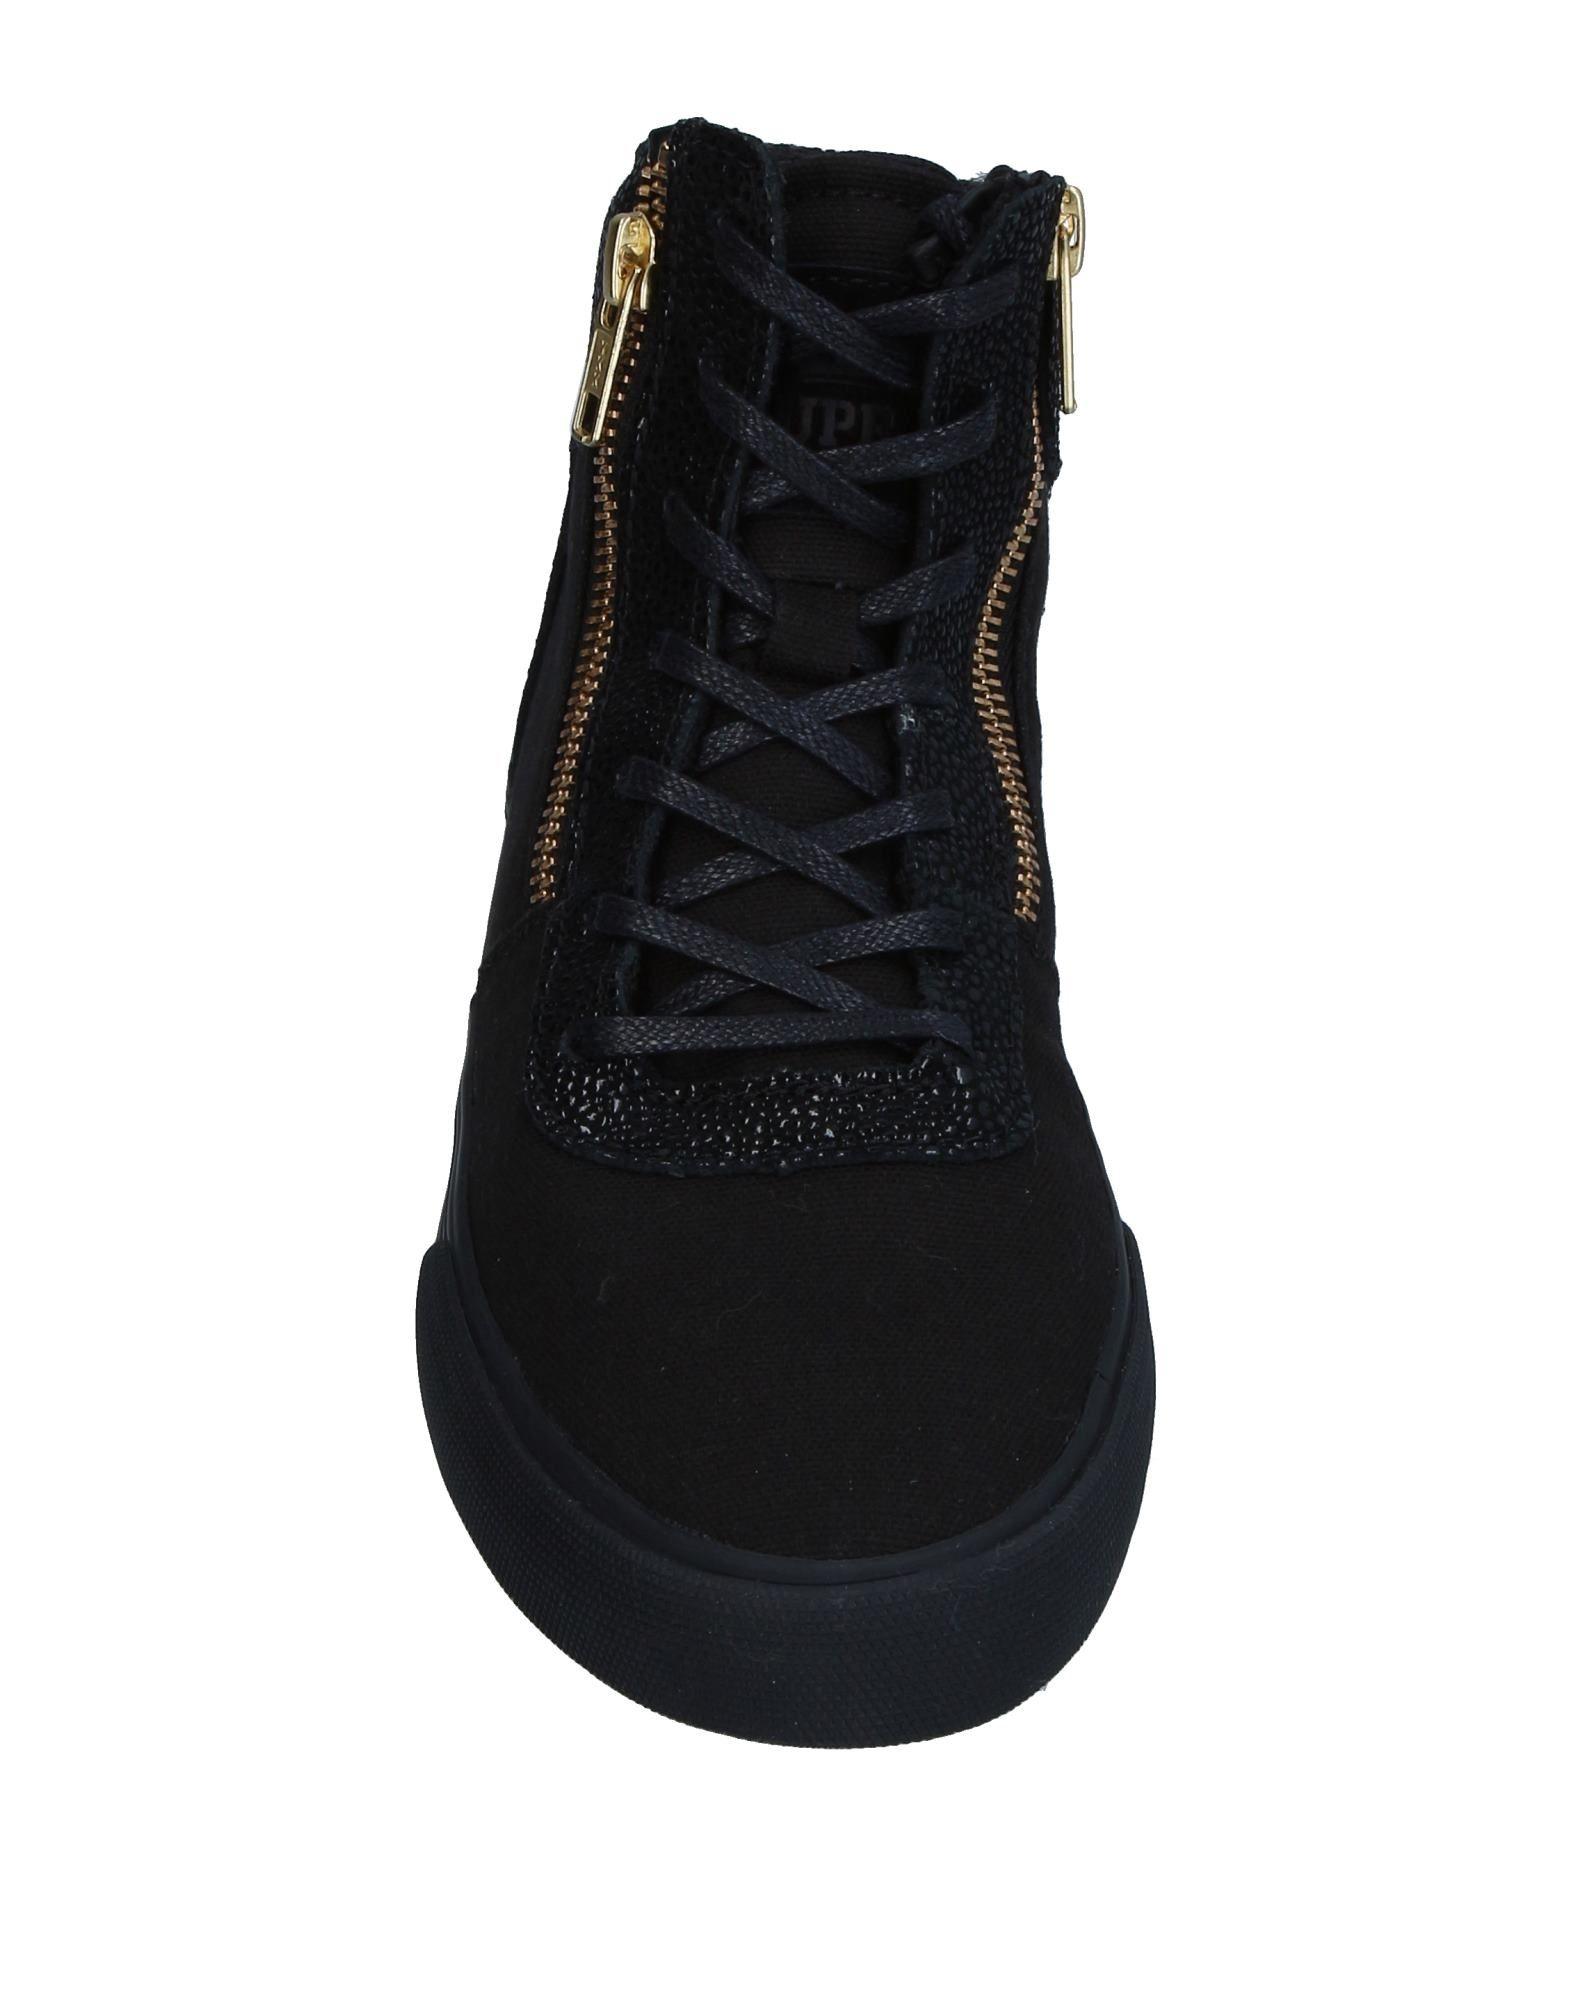 Moda Sneakers Sneakers Moda Supra Donna - 11337455FV 91ccee